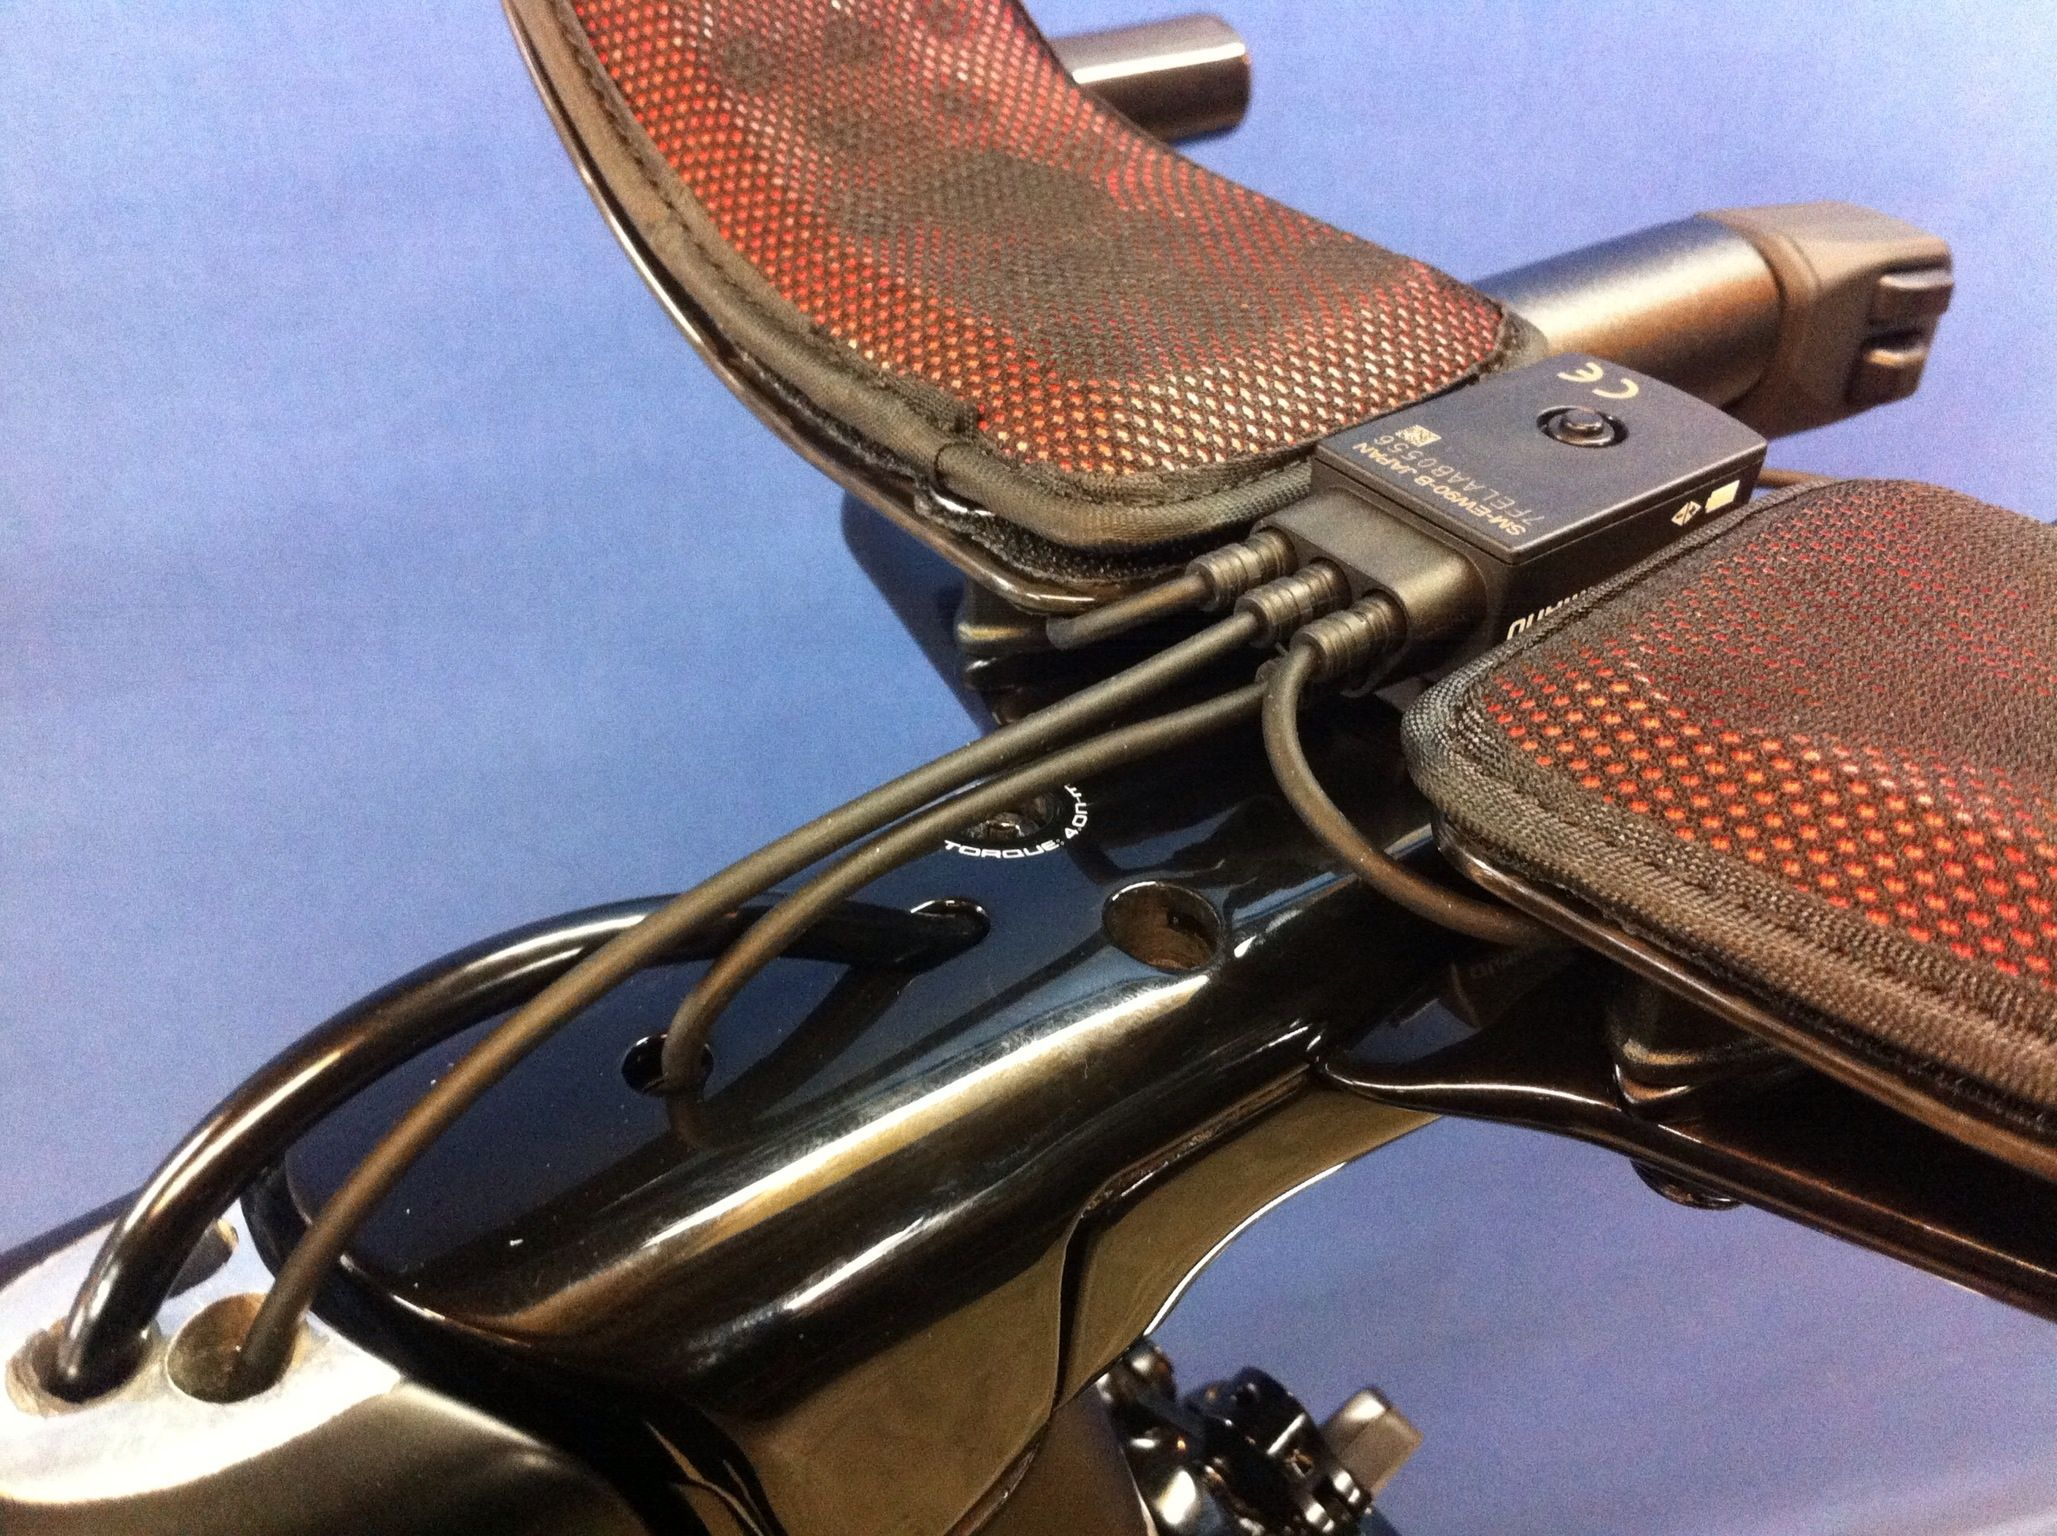 ba0f01602fe S-Works Shiv TT - Shimano Dura-Ace 9070 Di2 Custom Build | Cycling ...